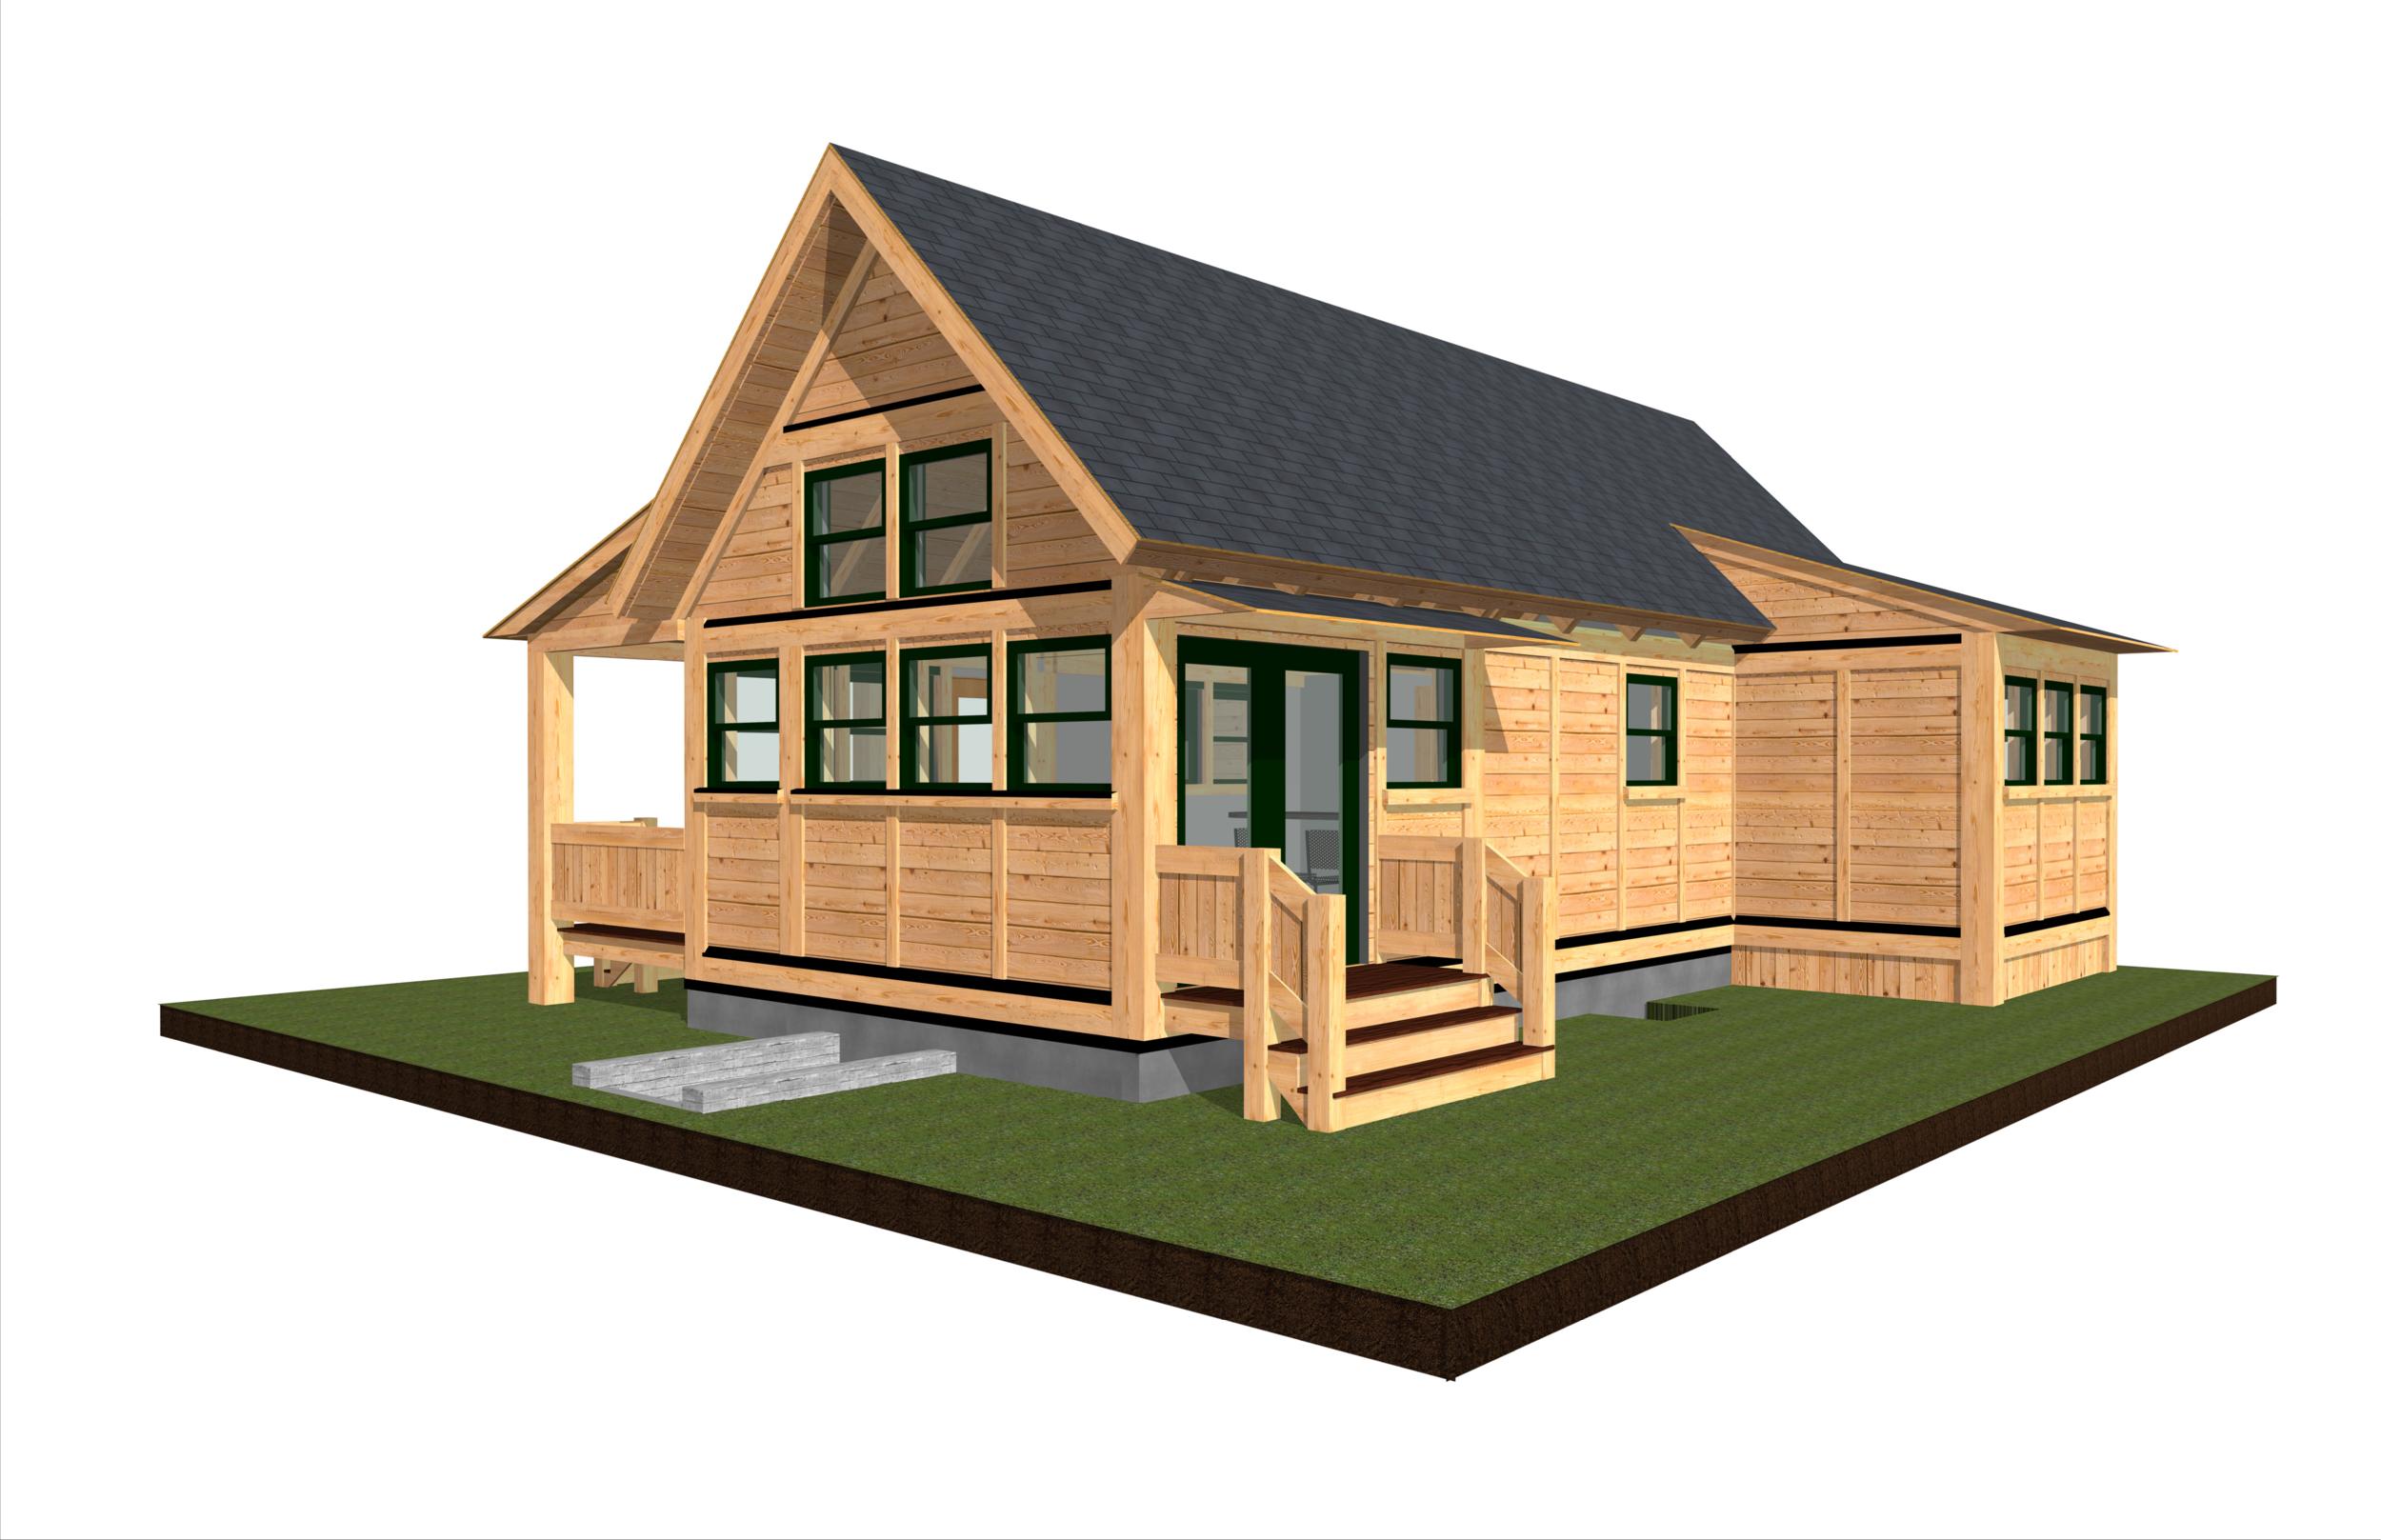 Tiny Timber single floor 2 bedroom home